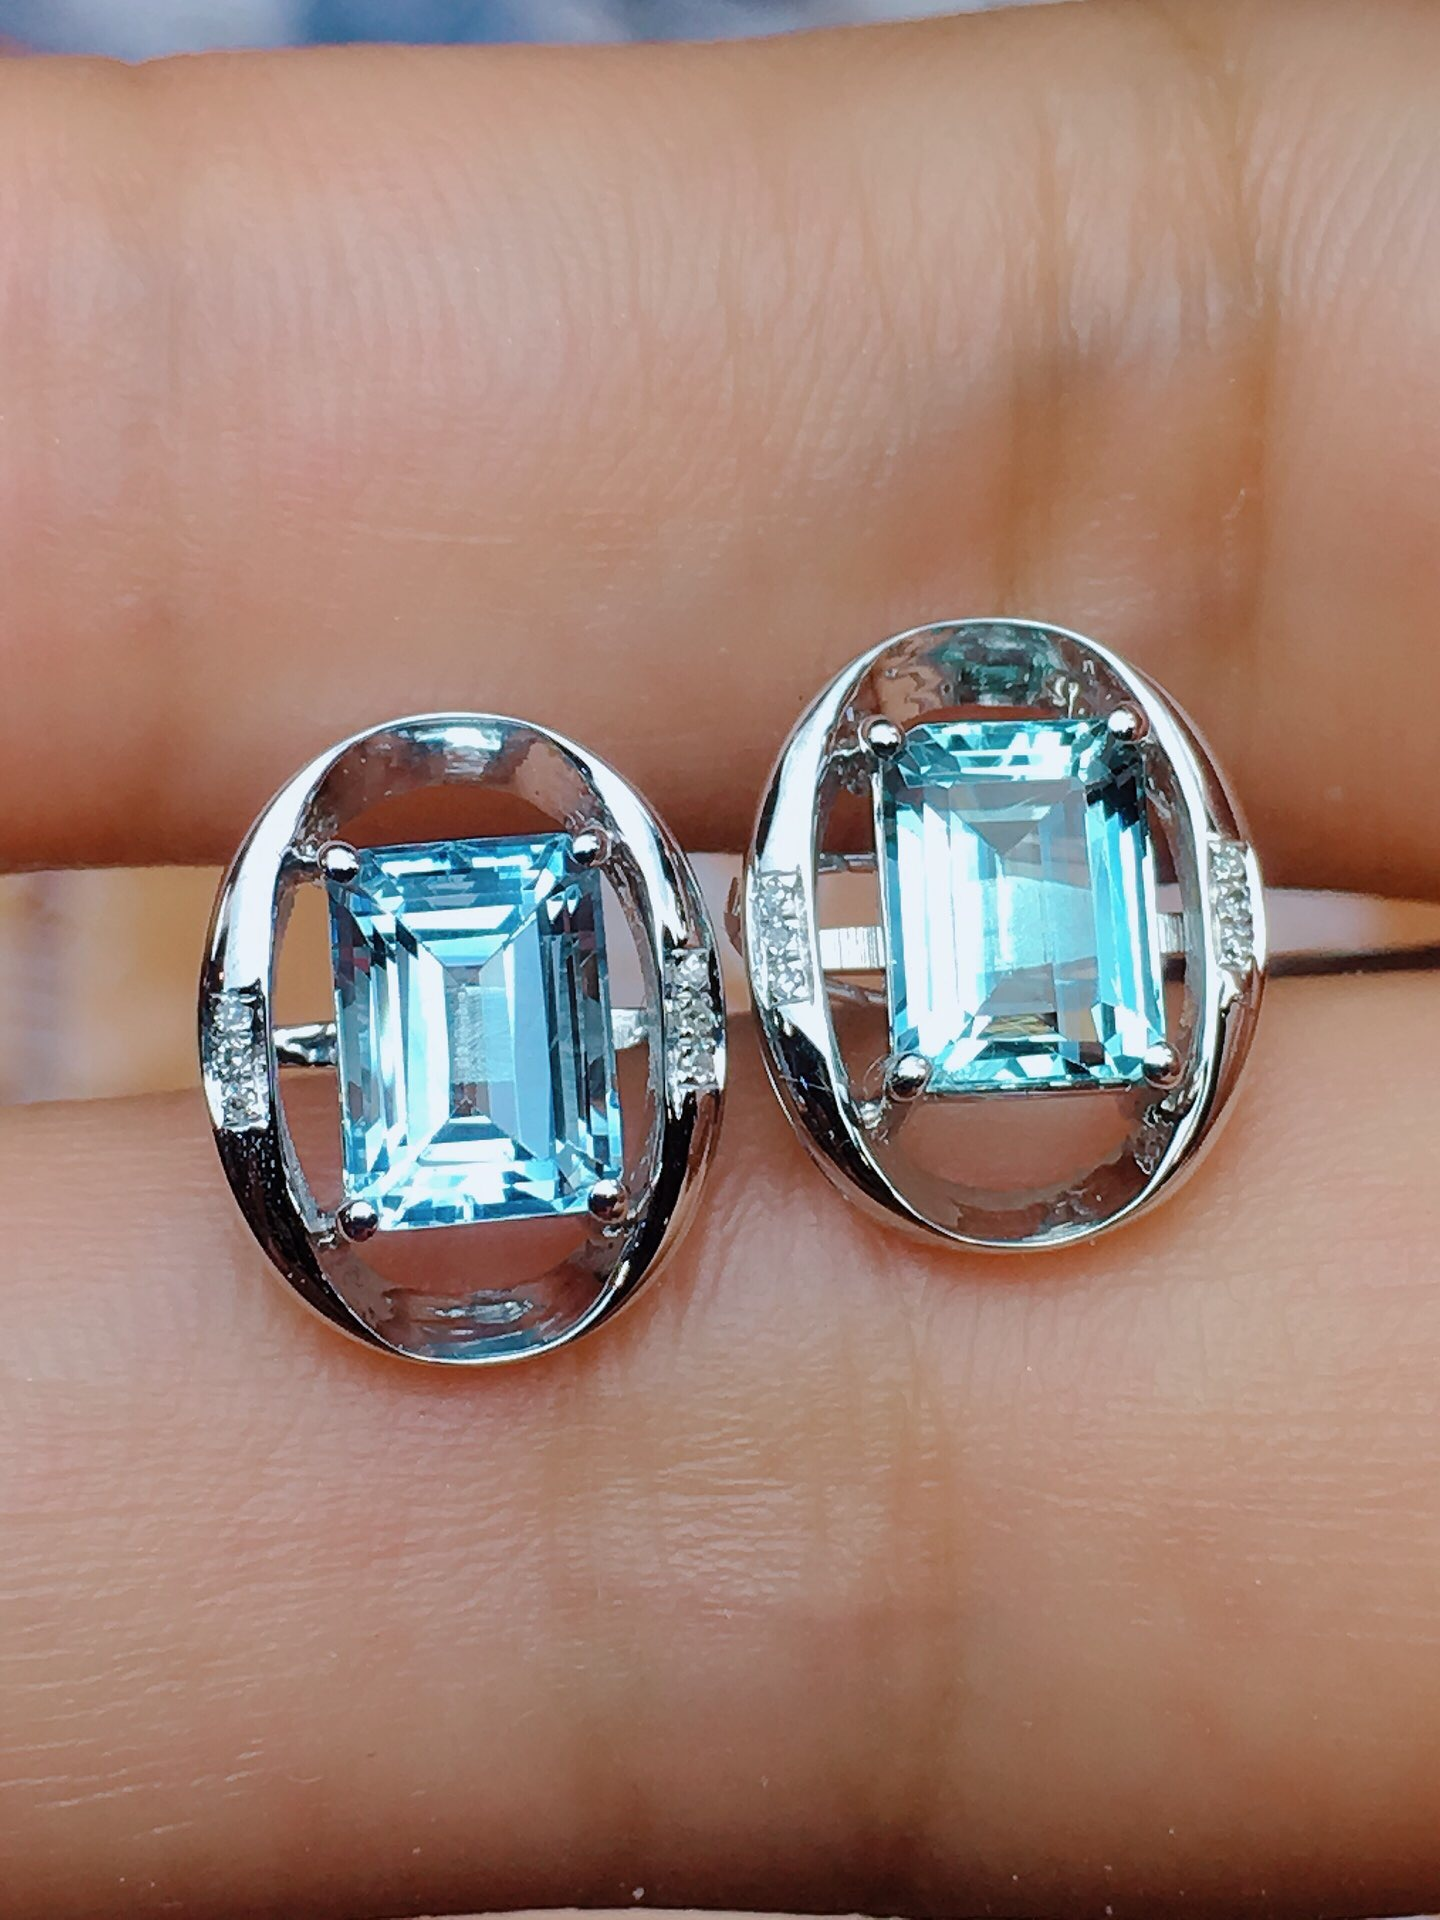 Fine Jewelry Pure 18K White Gold Natural Aquamarine Gemstone 2.6ct Diamonds Female's Earrings for Women FIne Earrings